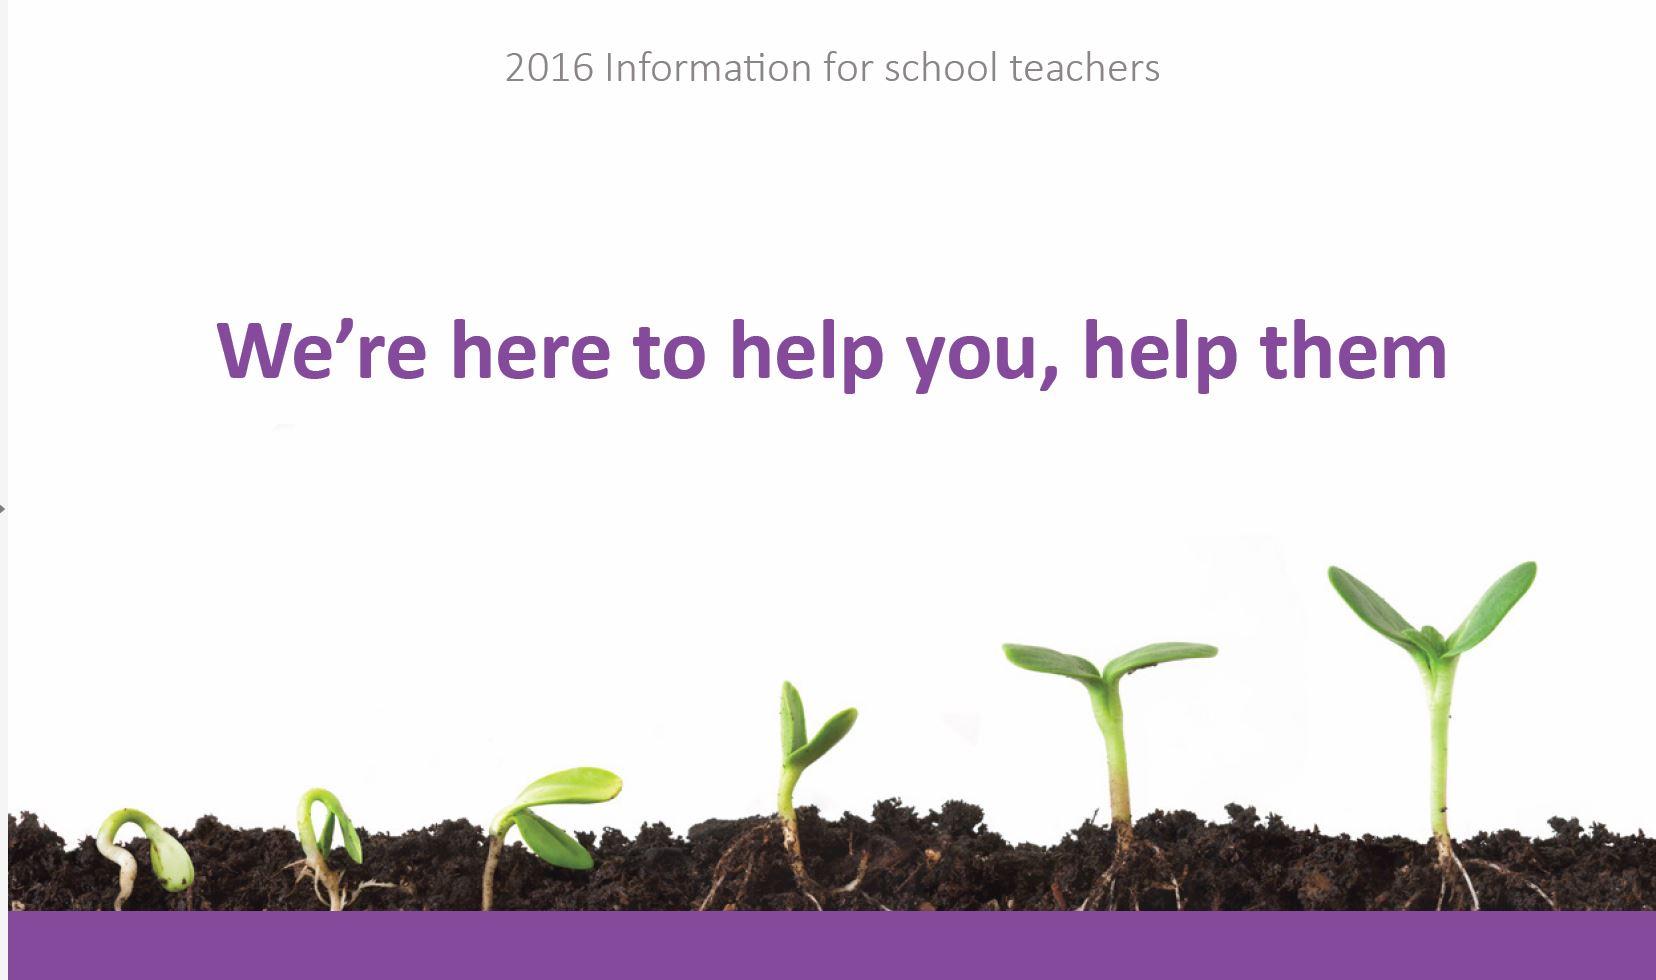 Information sheet for teachers about YourTutor